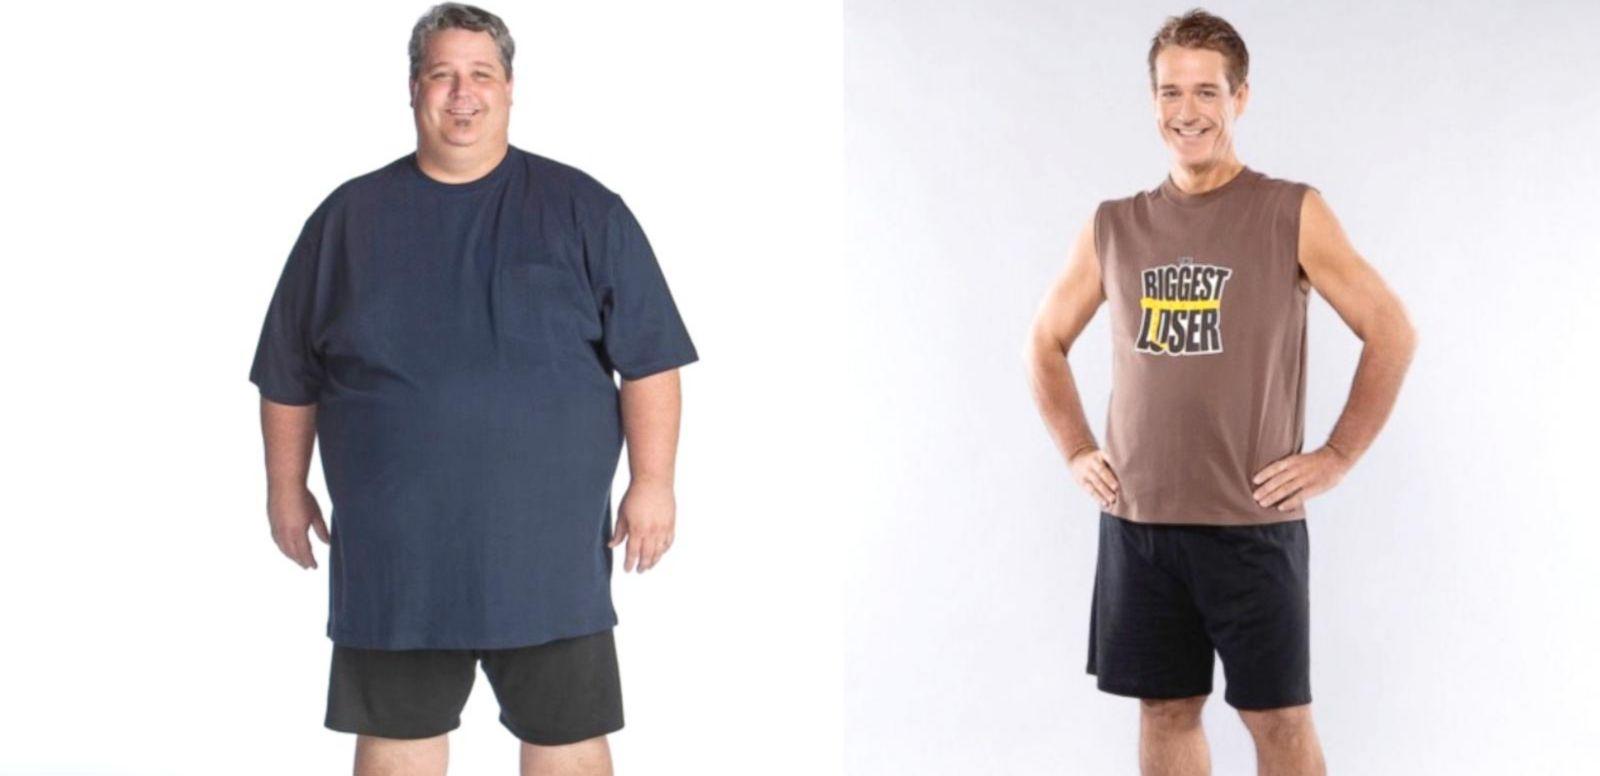 VIDEO: New Study Reveals Why 'Biggest Loser' Winners Often Regain Weight